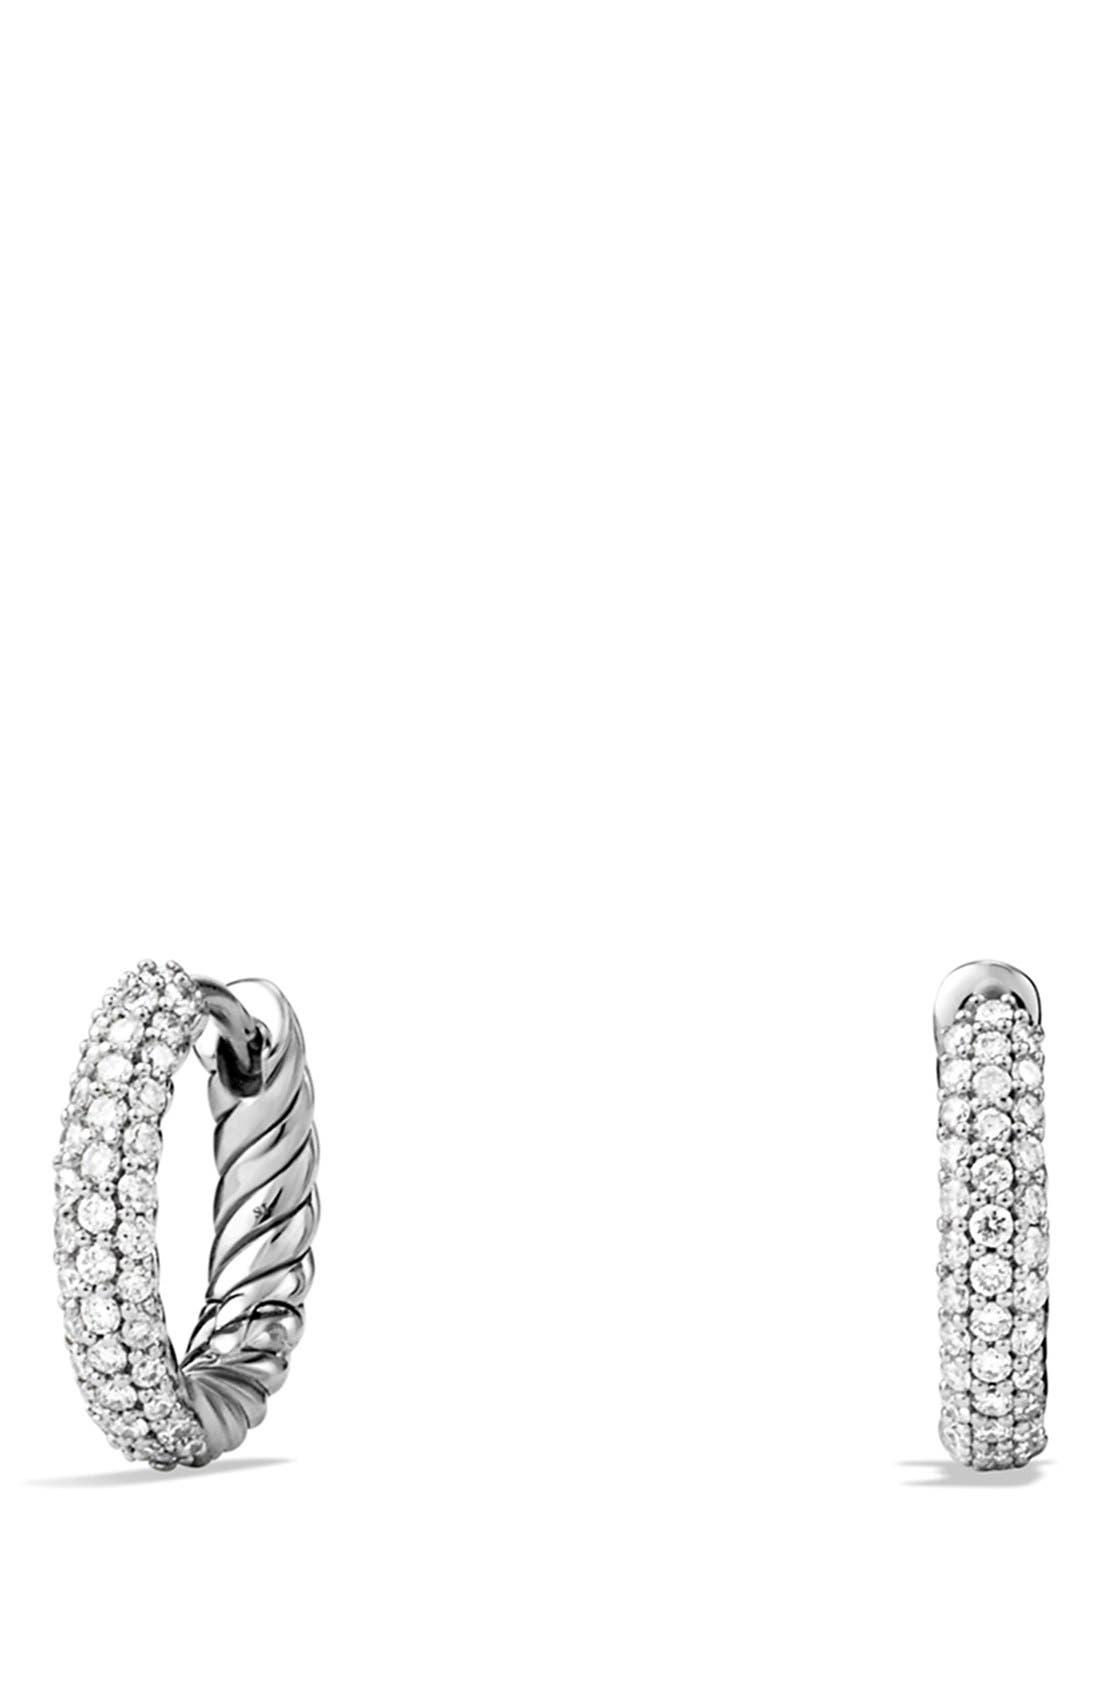 Petite Pavé Earrings with Diamonds,                             Main thumbnail 1, color,                             Diamond